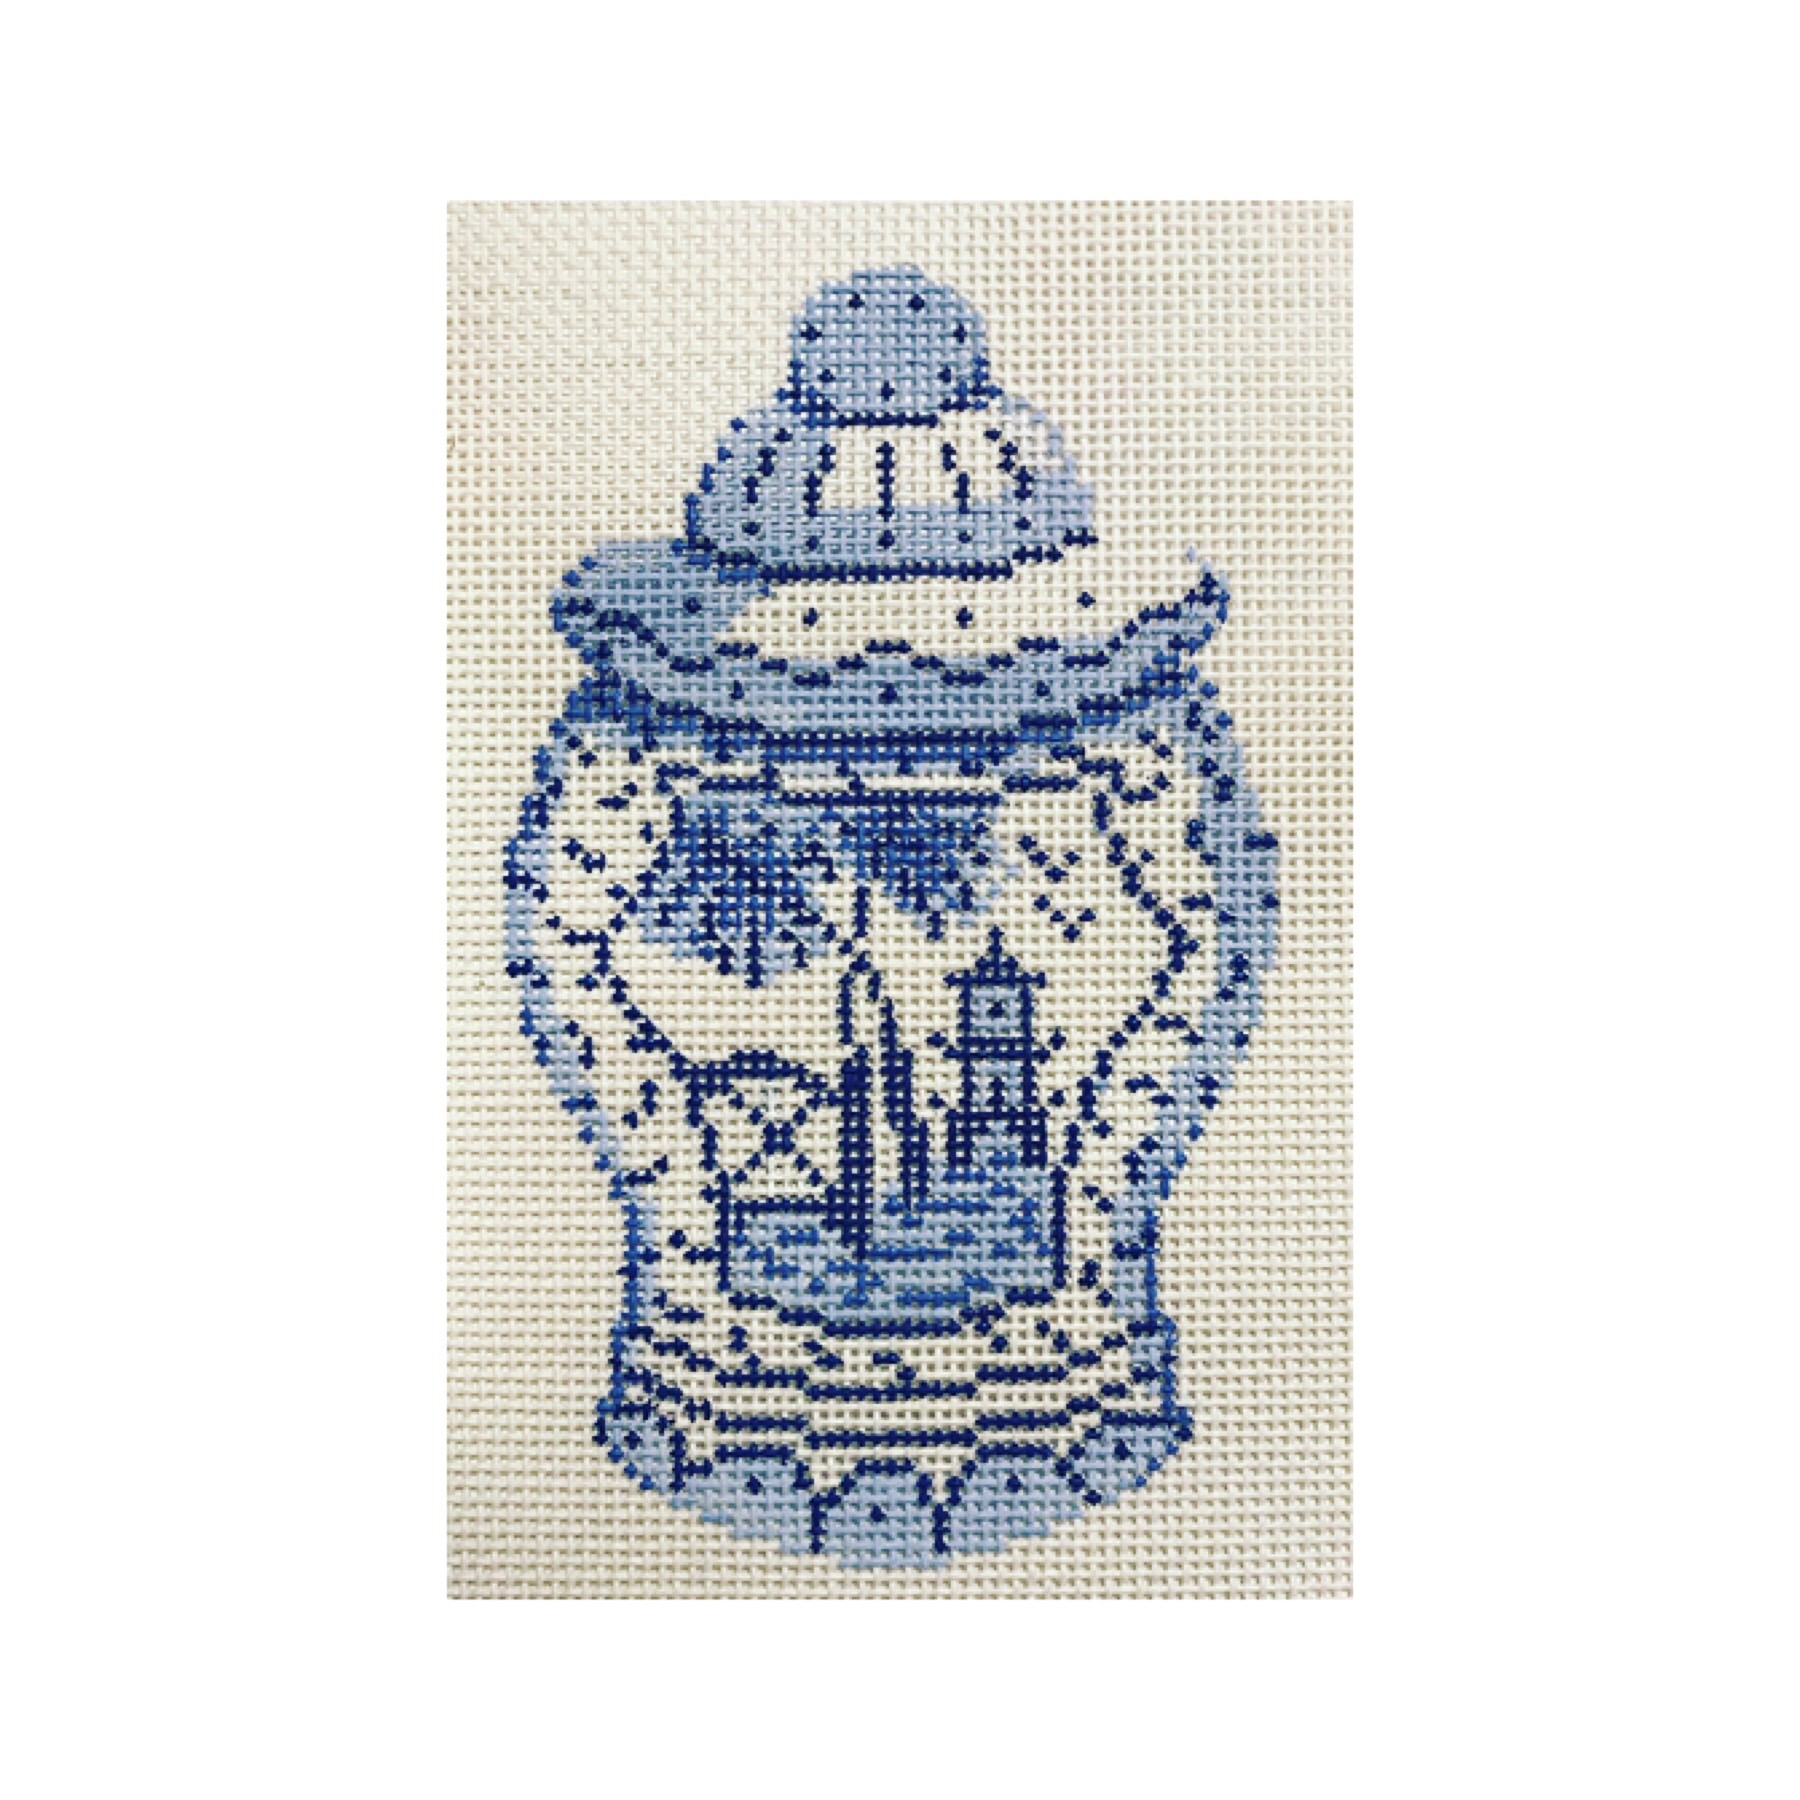 "Ginger Jar Ornament DM-1C  5"" x 3"" on 18 mesh"